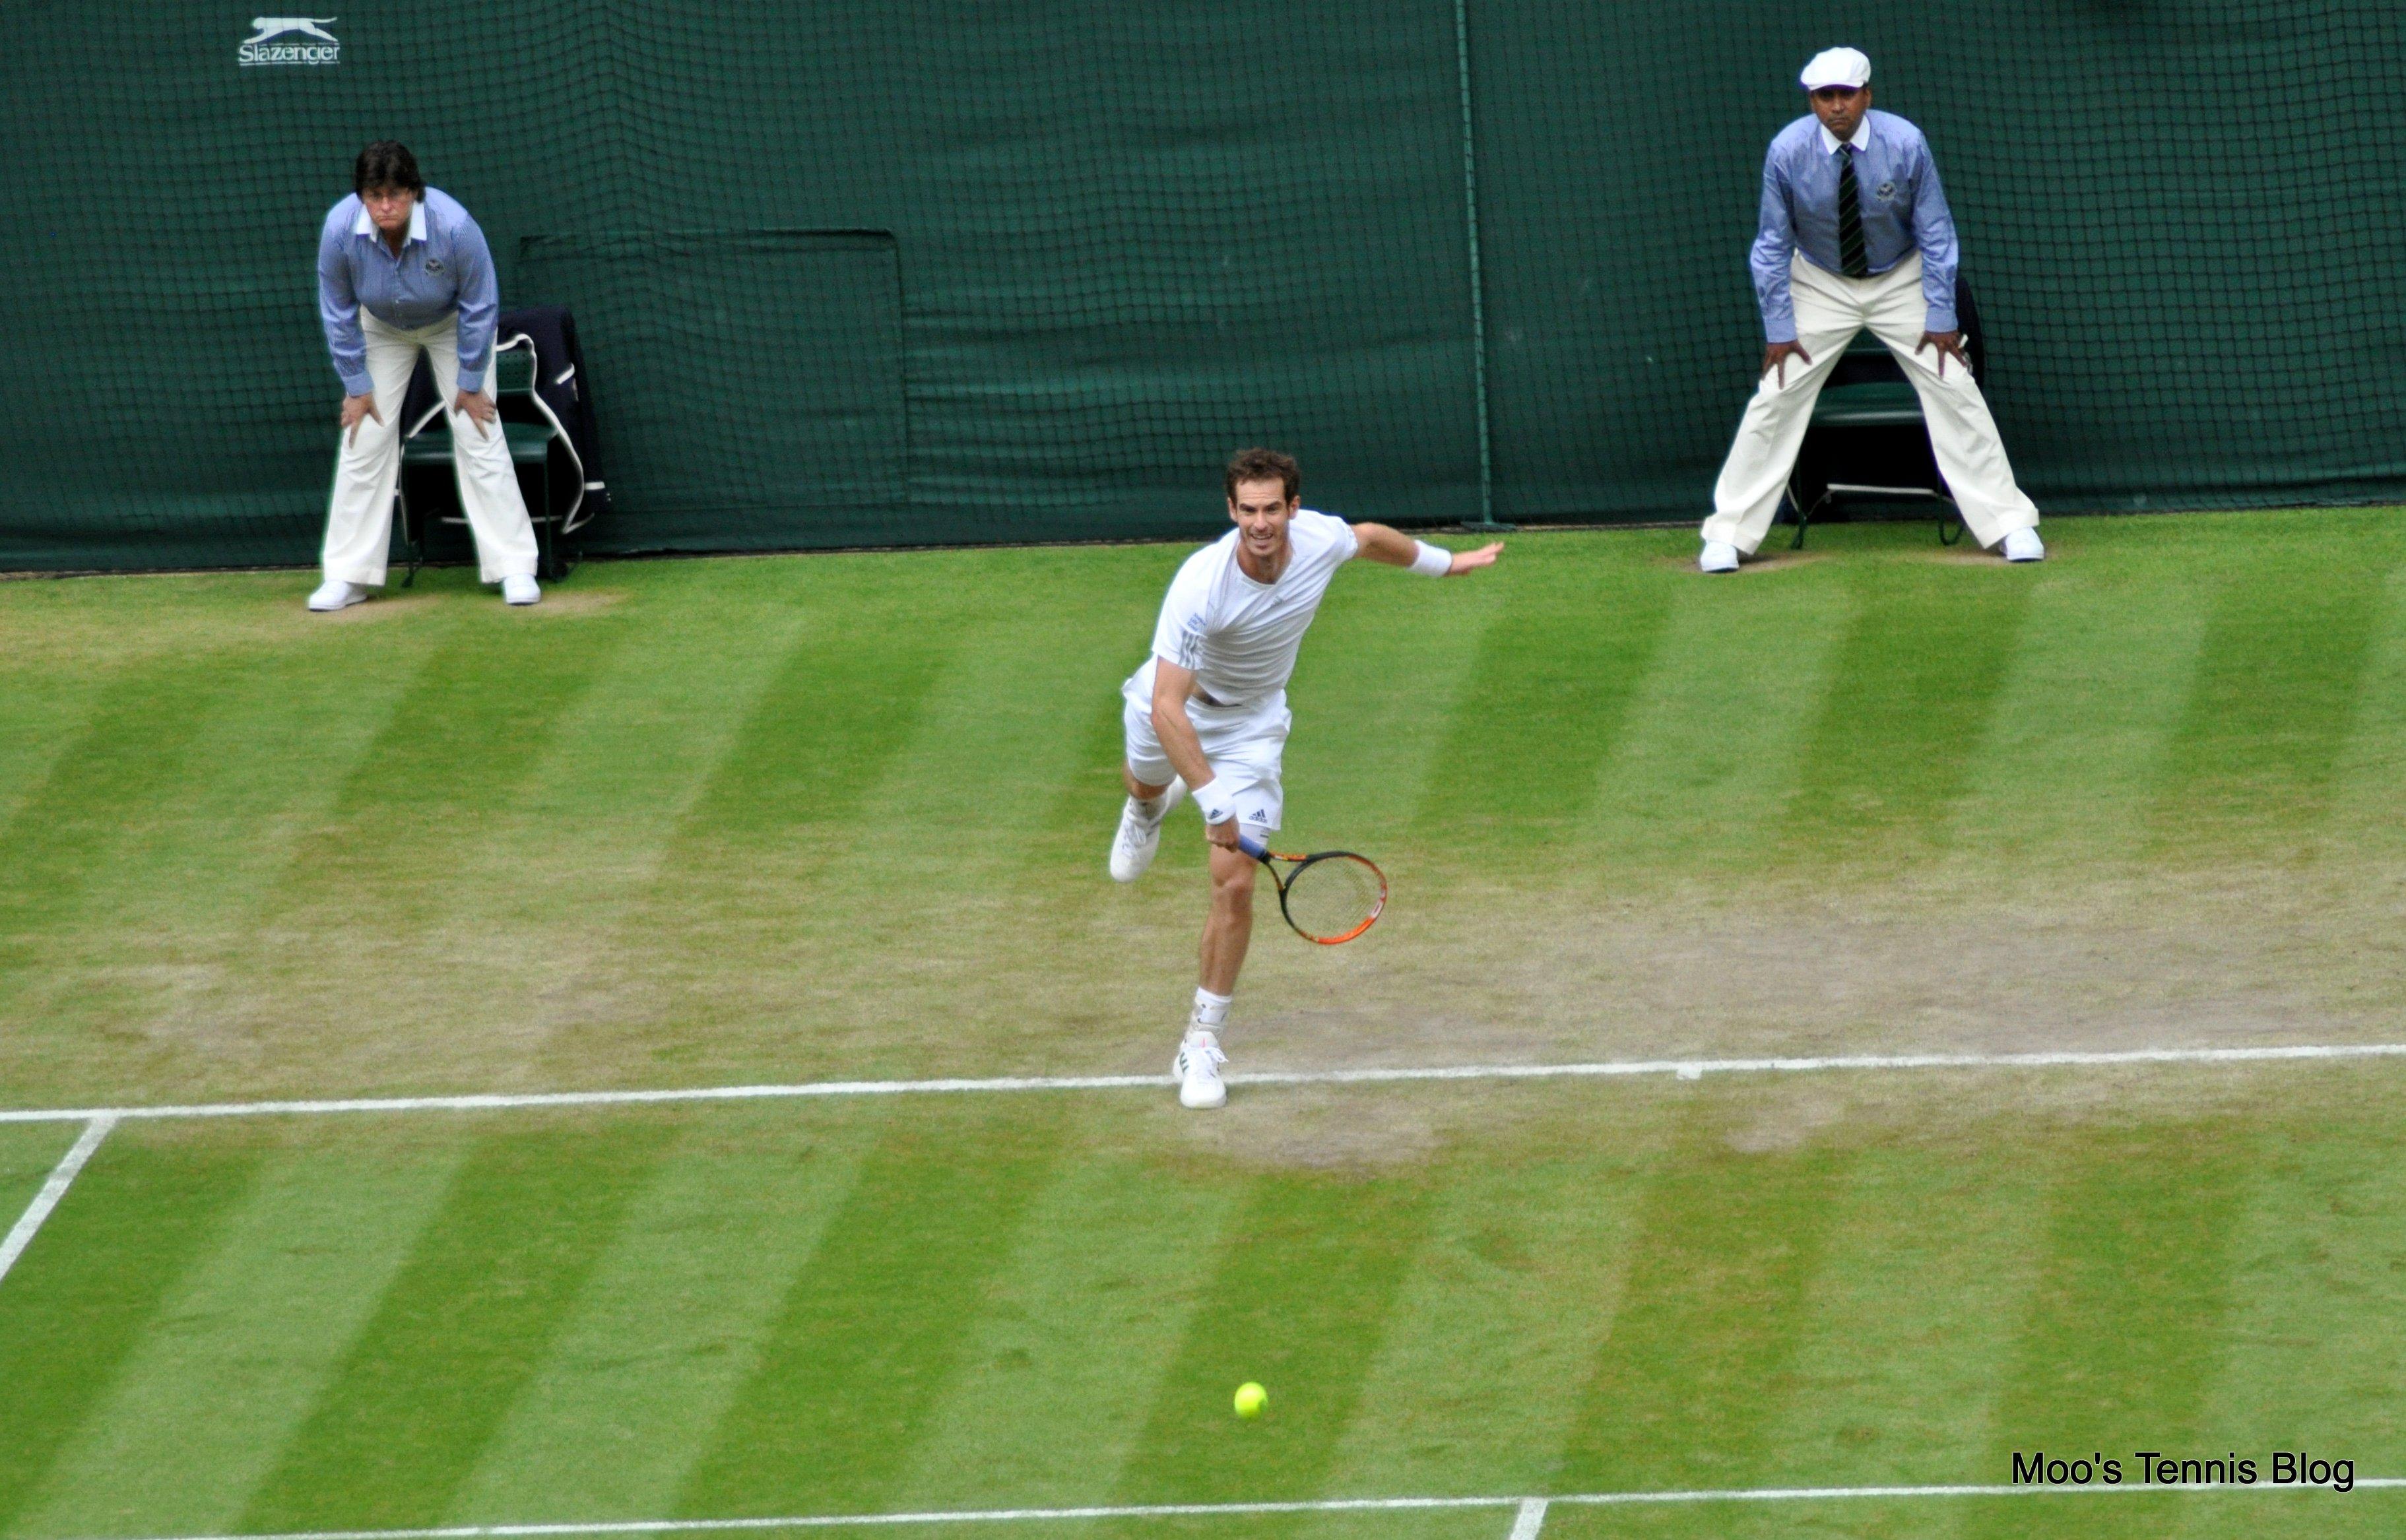 2015 Australian Open Men S Final Preview Novak Djokovic V Andy Murray Moo S Tennis Blog